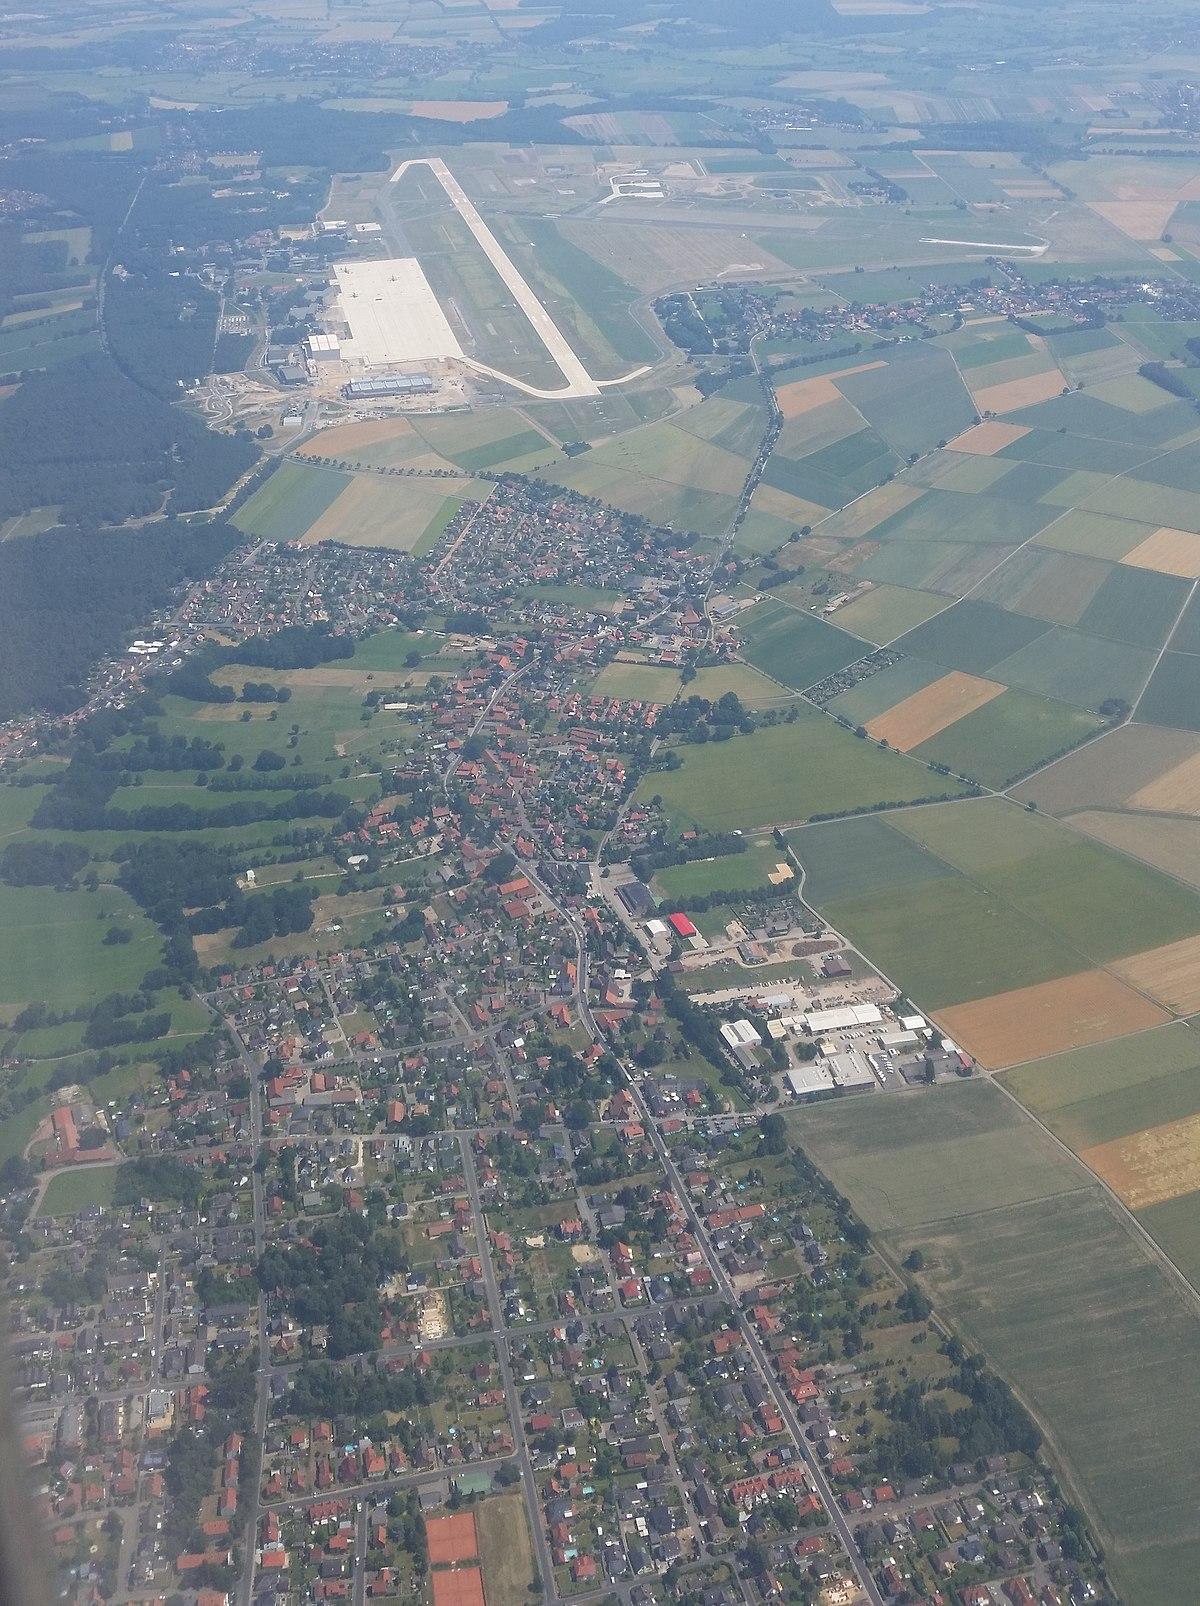 Fliegerhorst Wunstorf – Wikipedia